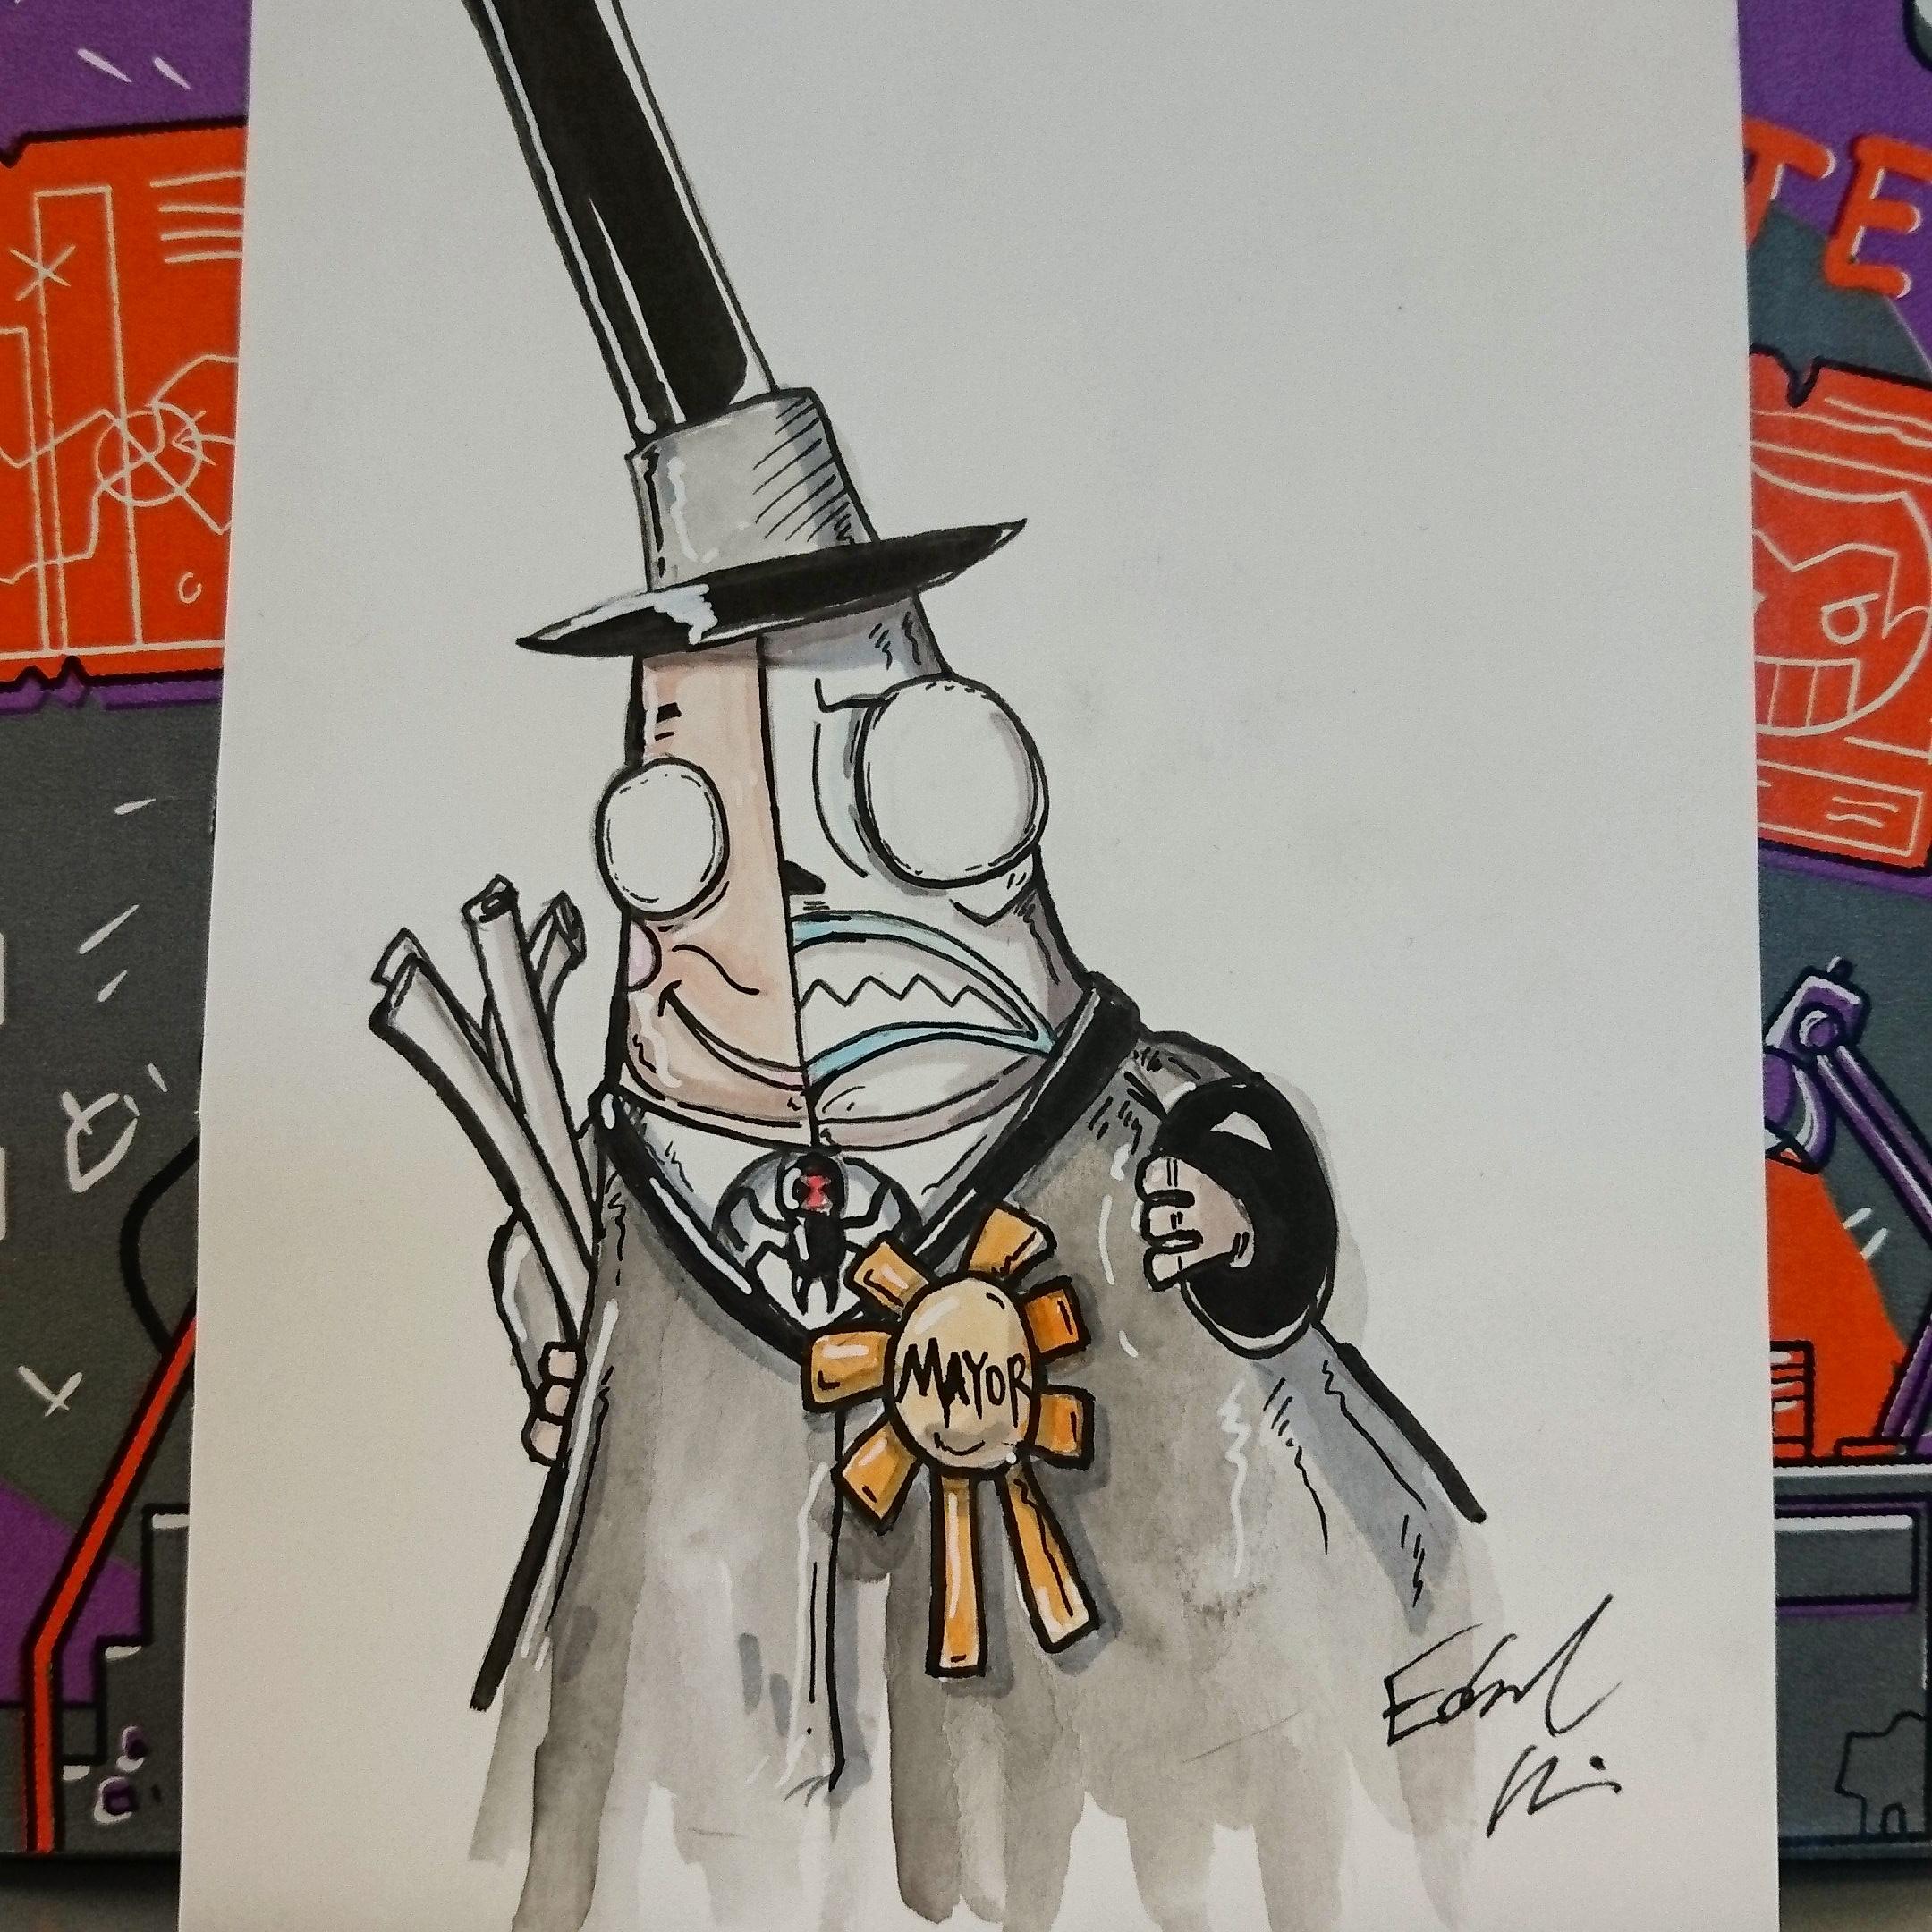 8b4aea2e72e Mayor (Nightmare Before Christmas) · Taco Boy Designs · Online Store ...